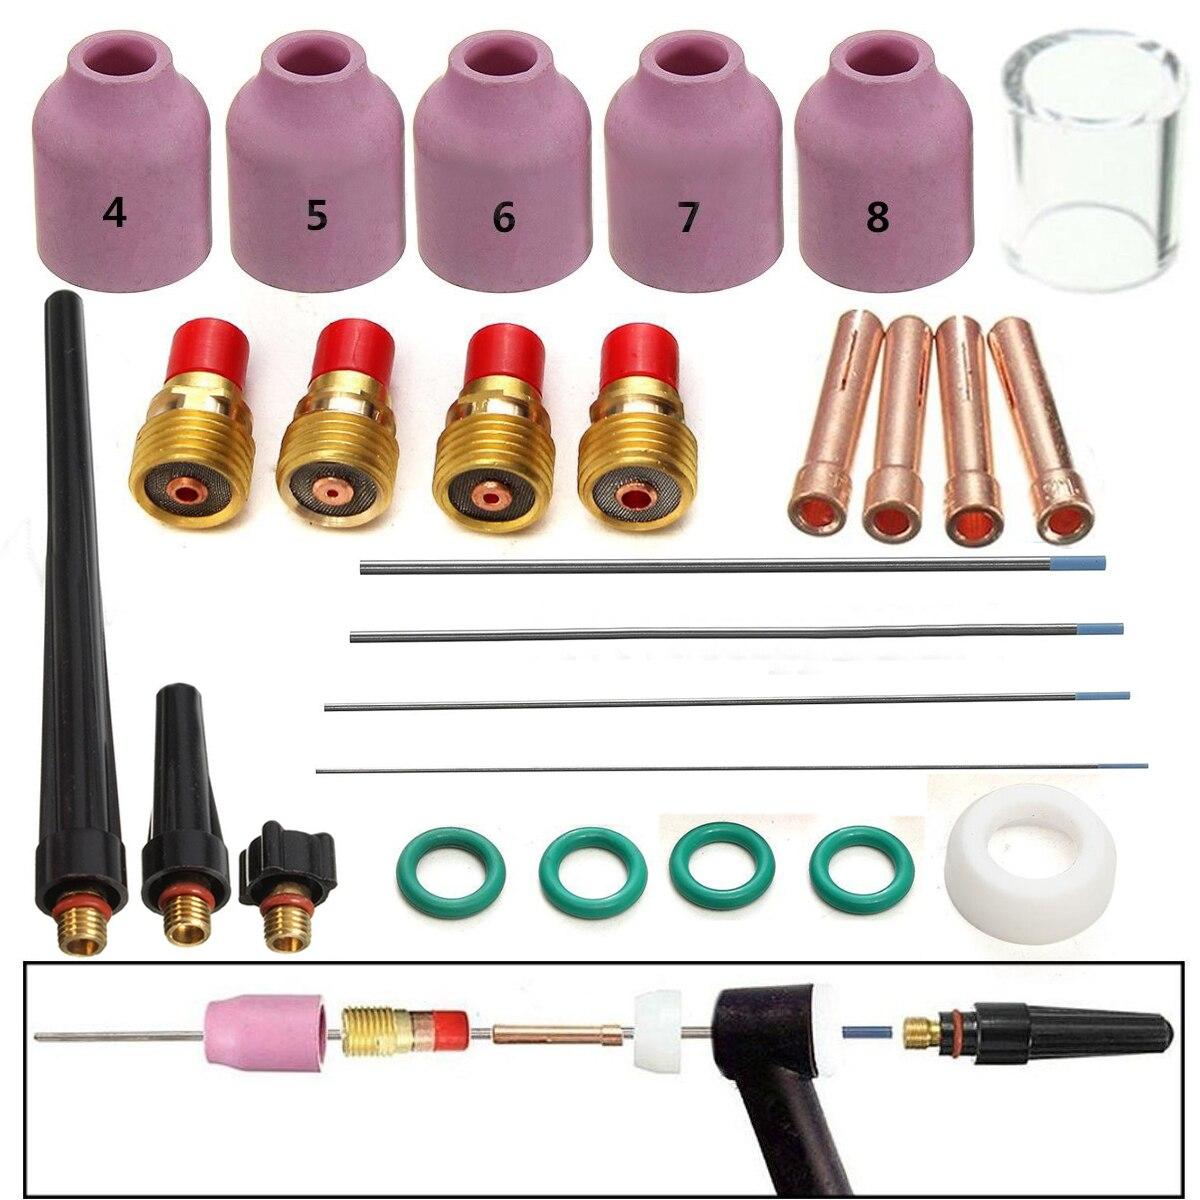 26pcs x Welding Torch Nozzle Cup Tungsten Gas Lens WL20 Kit For TIG WP-17 18 26 Part set